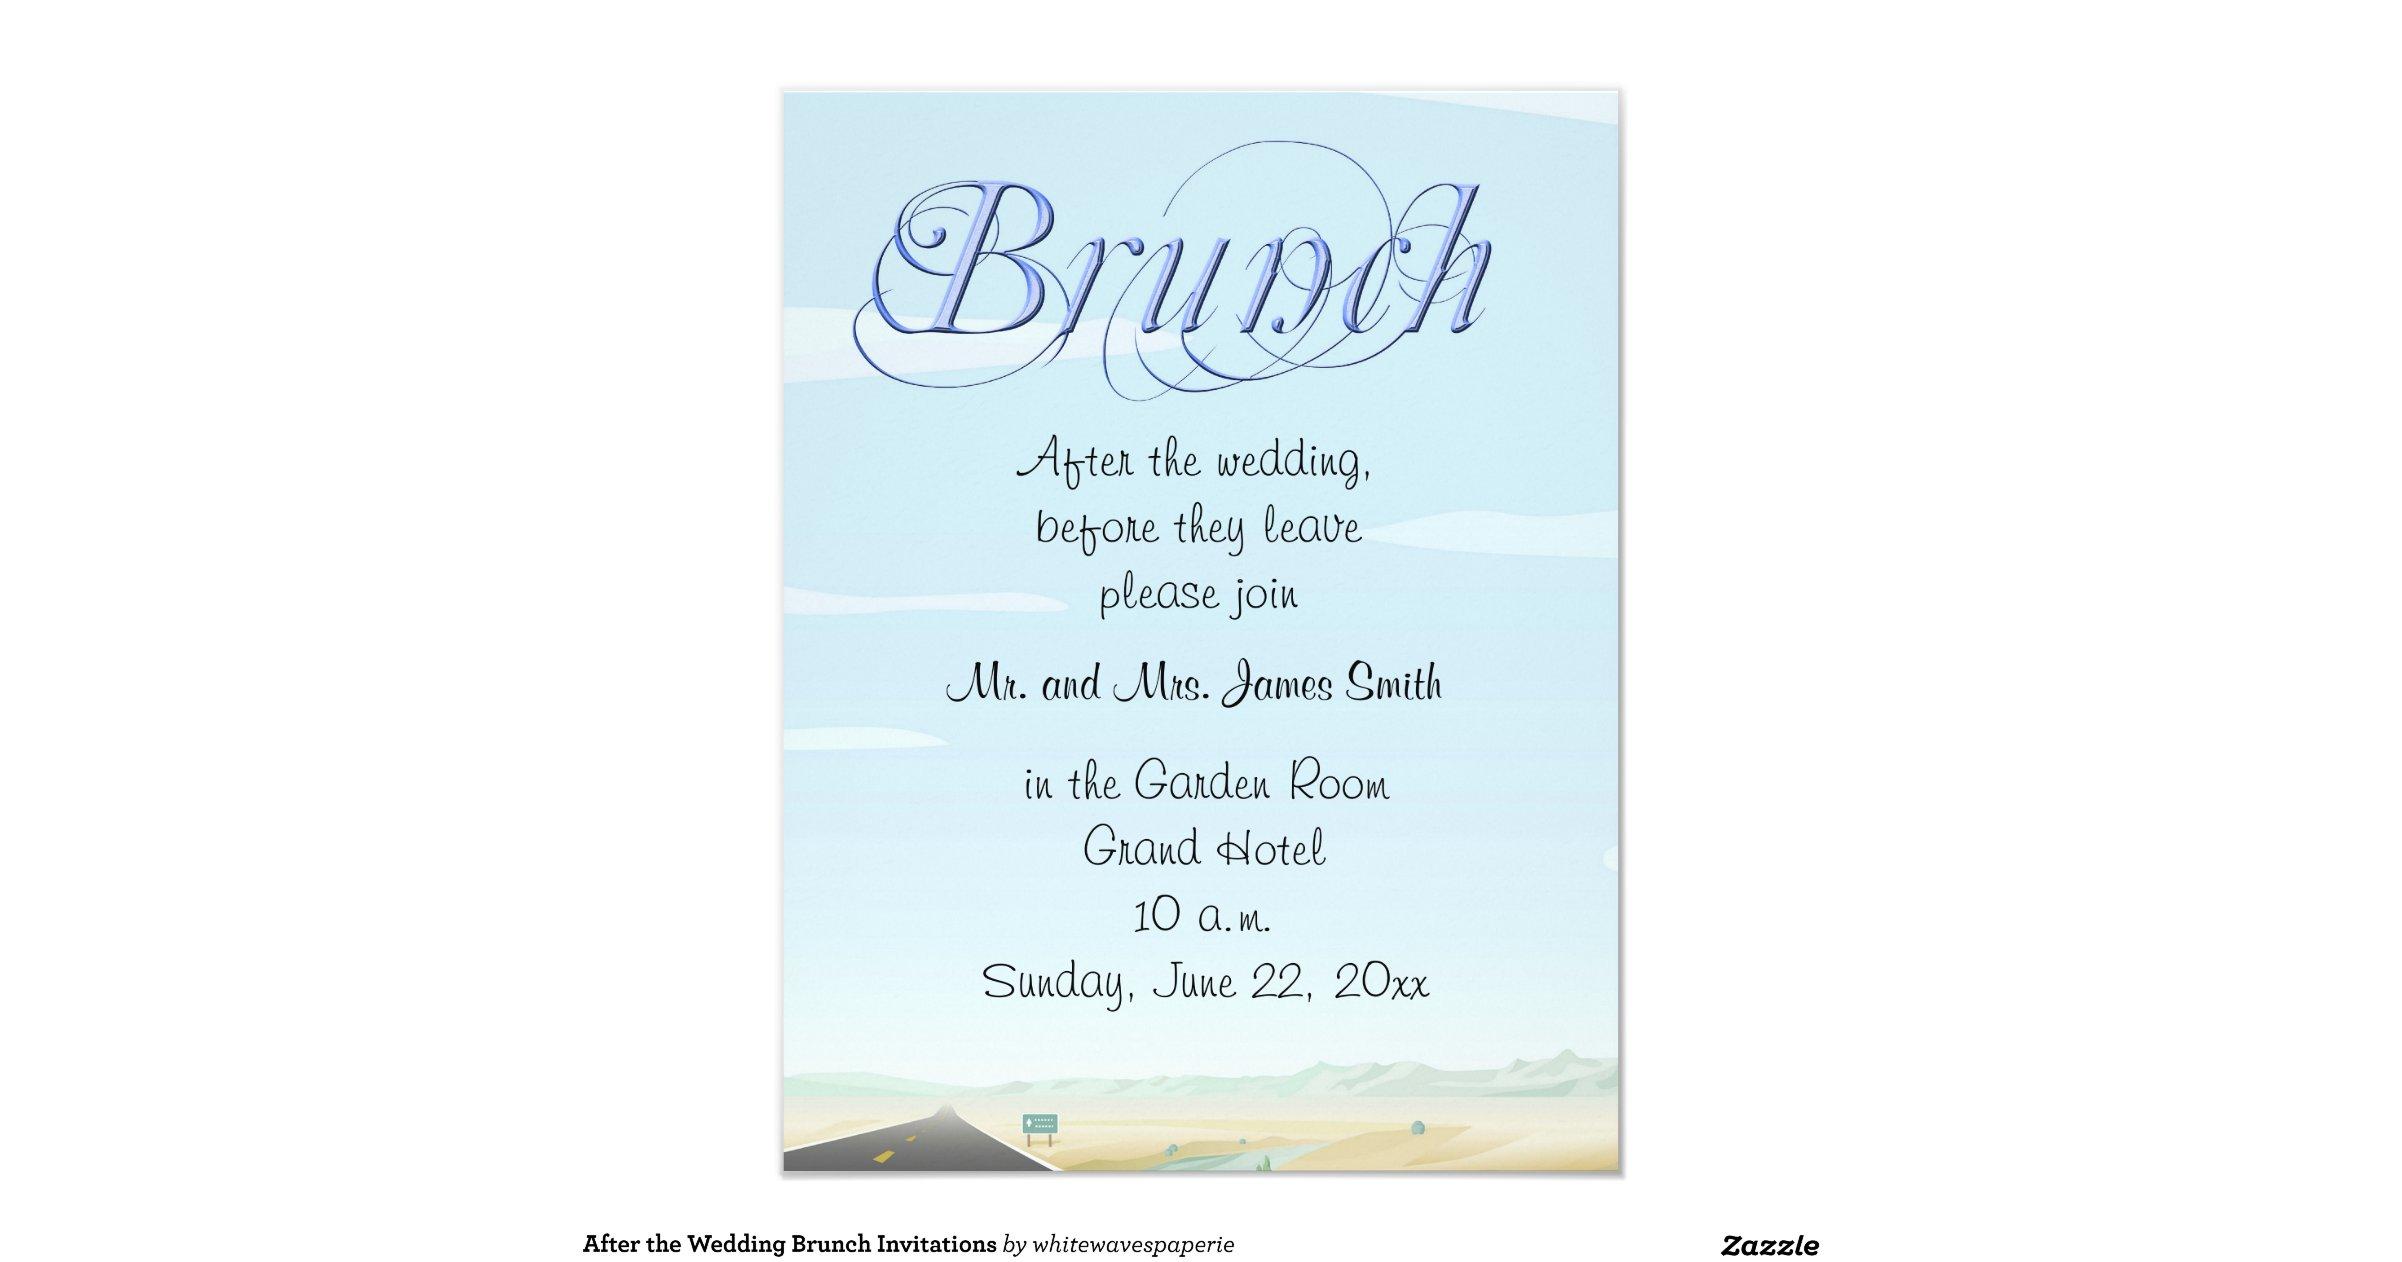 After Wedding Invitation Wording: After_the_wedding_brunch_invitations